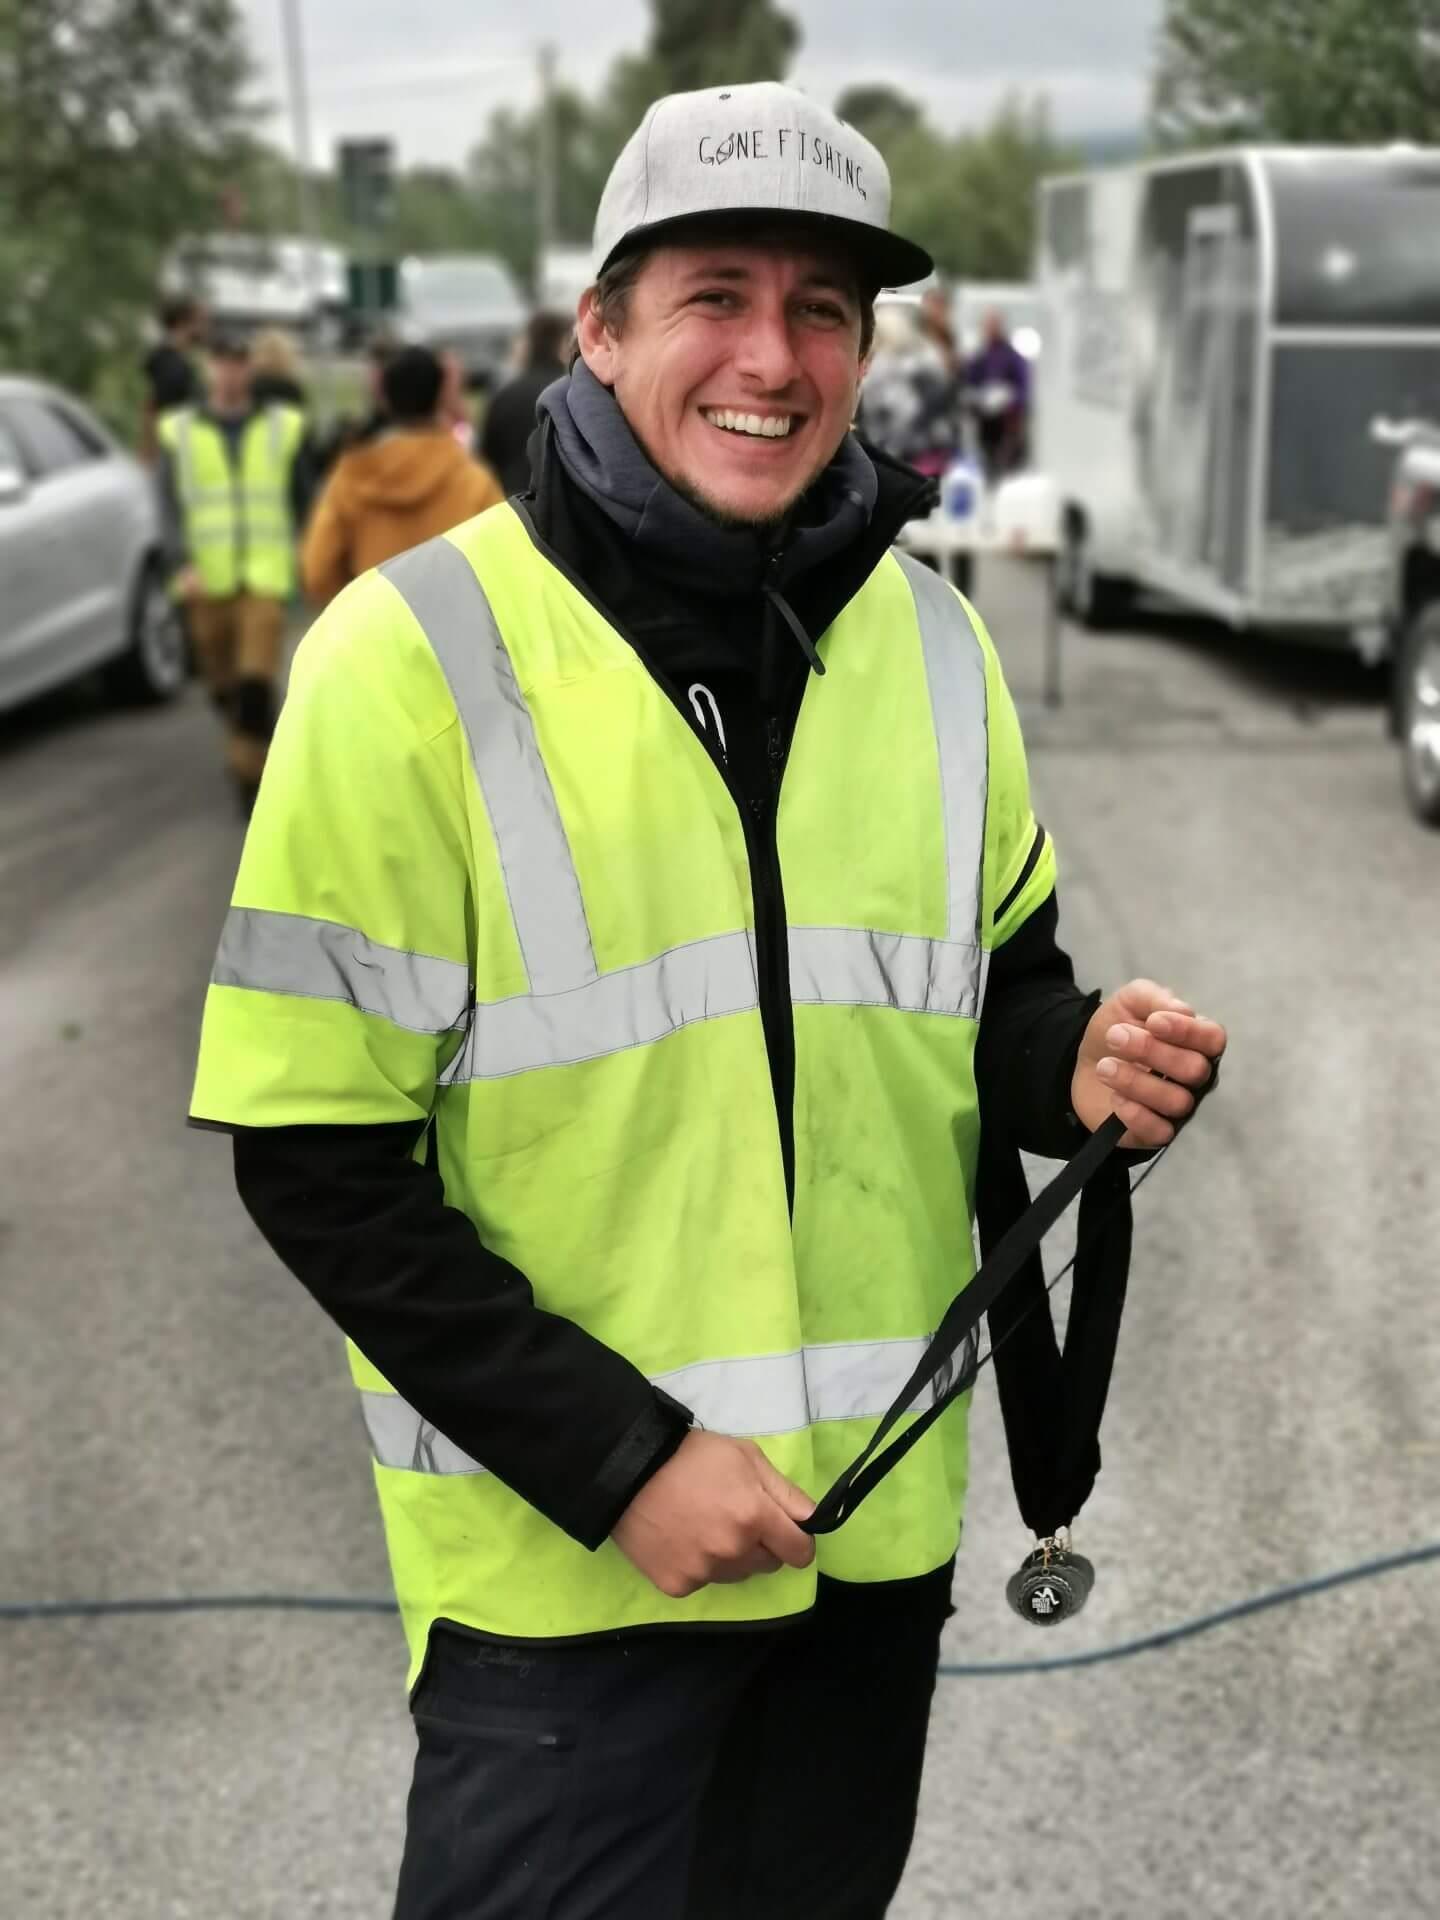 Arctic Circle Race 2019 Polcirkelloppet Guijaure Mål kranskulle